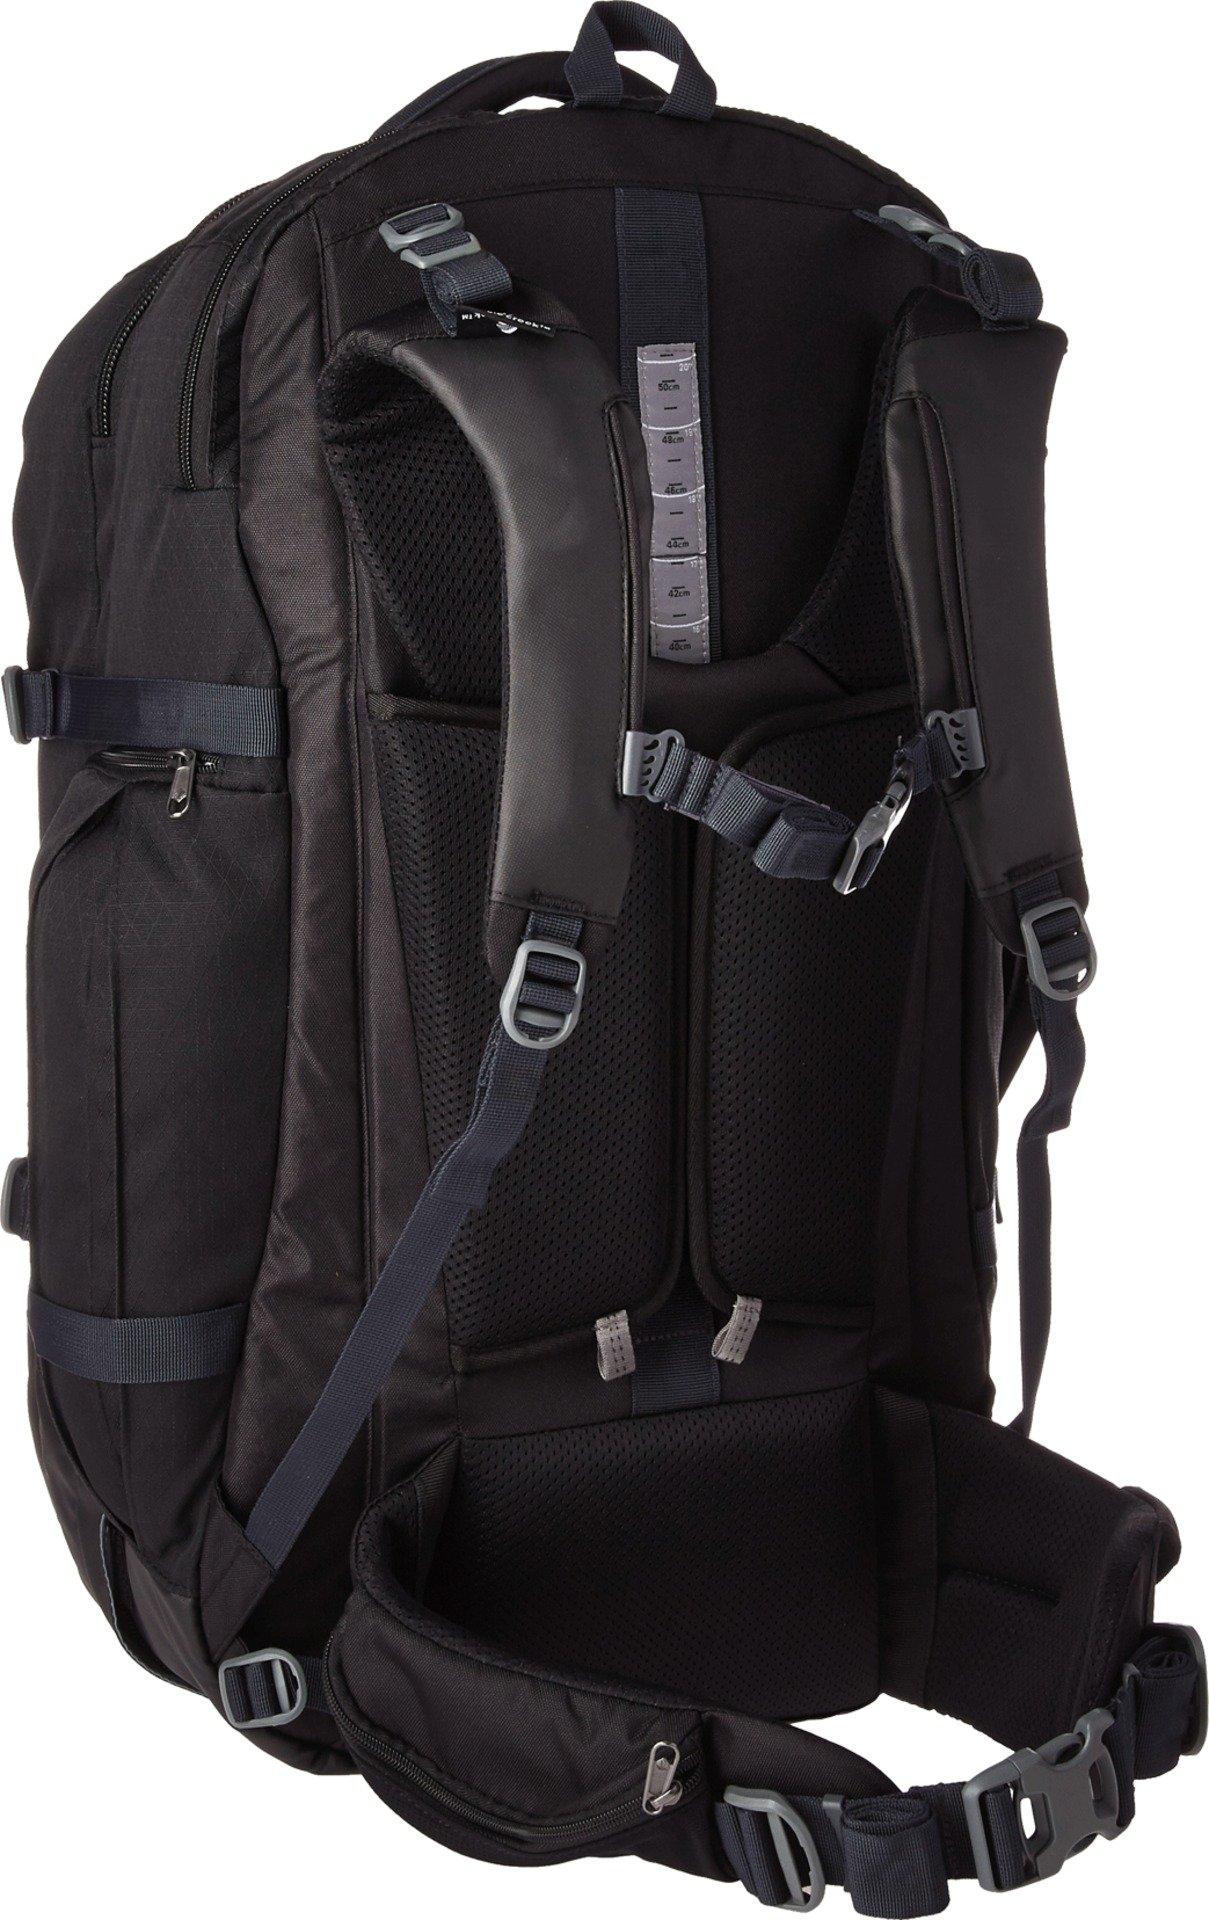 Eagle Creek Unisex Global Companion Travel Packs 65L Black One Size by Eagle Creek (Image #2)